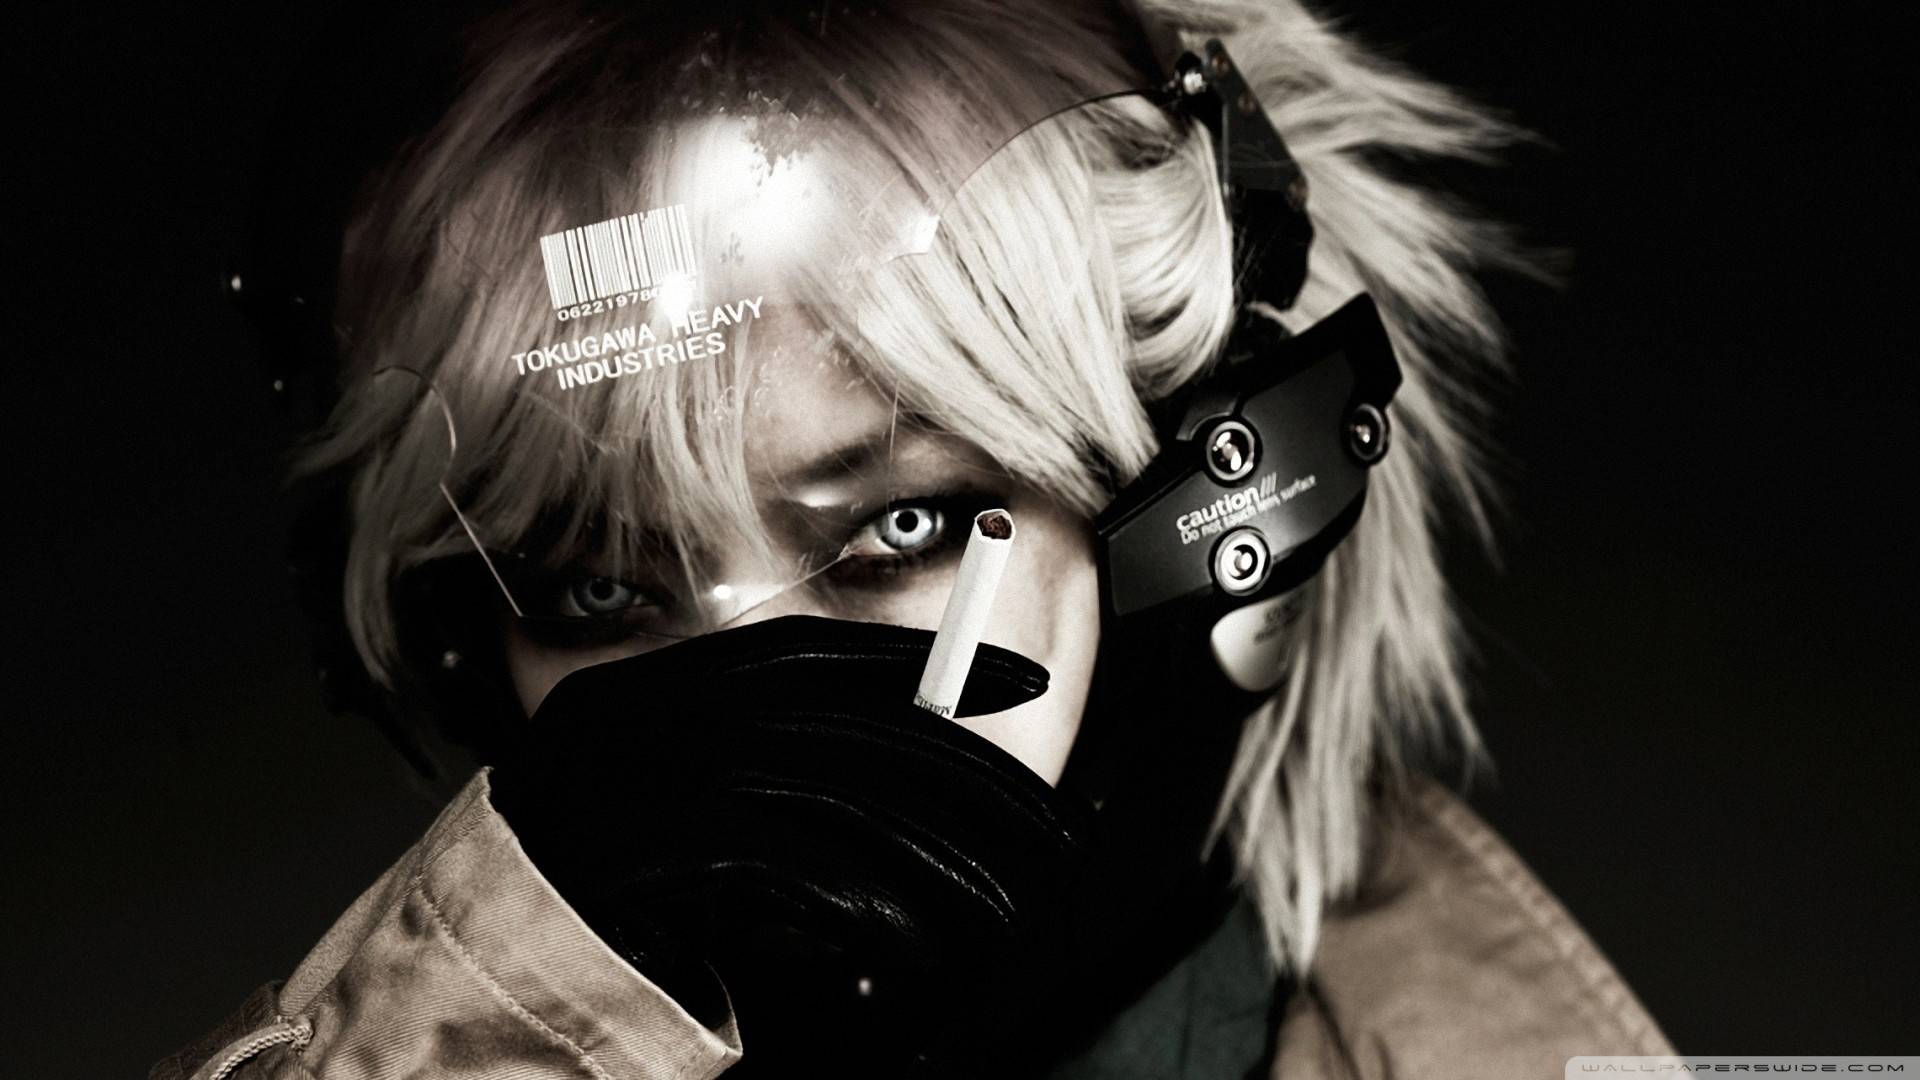 Metal Gear Rising Hd Wallpaper Background Image 1920x1080 Id